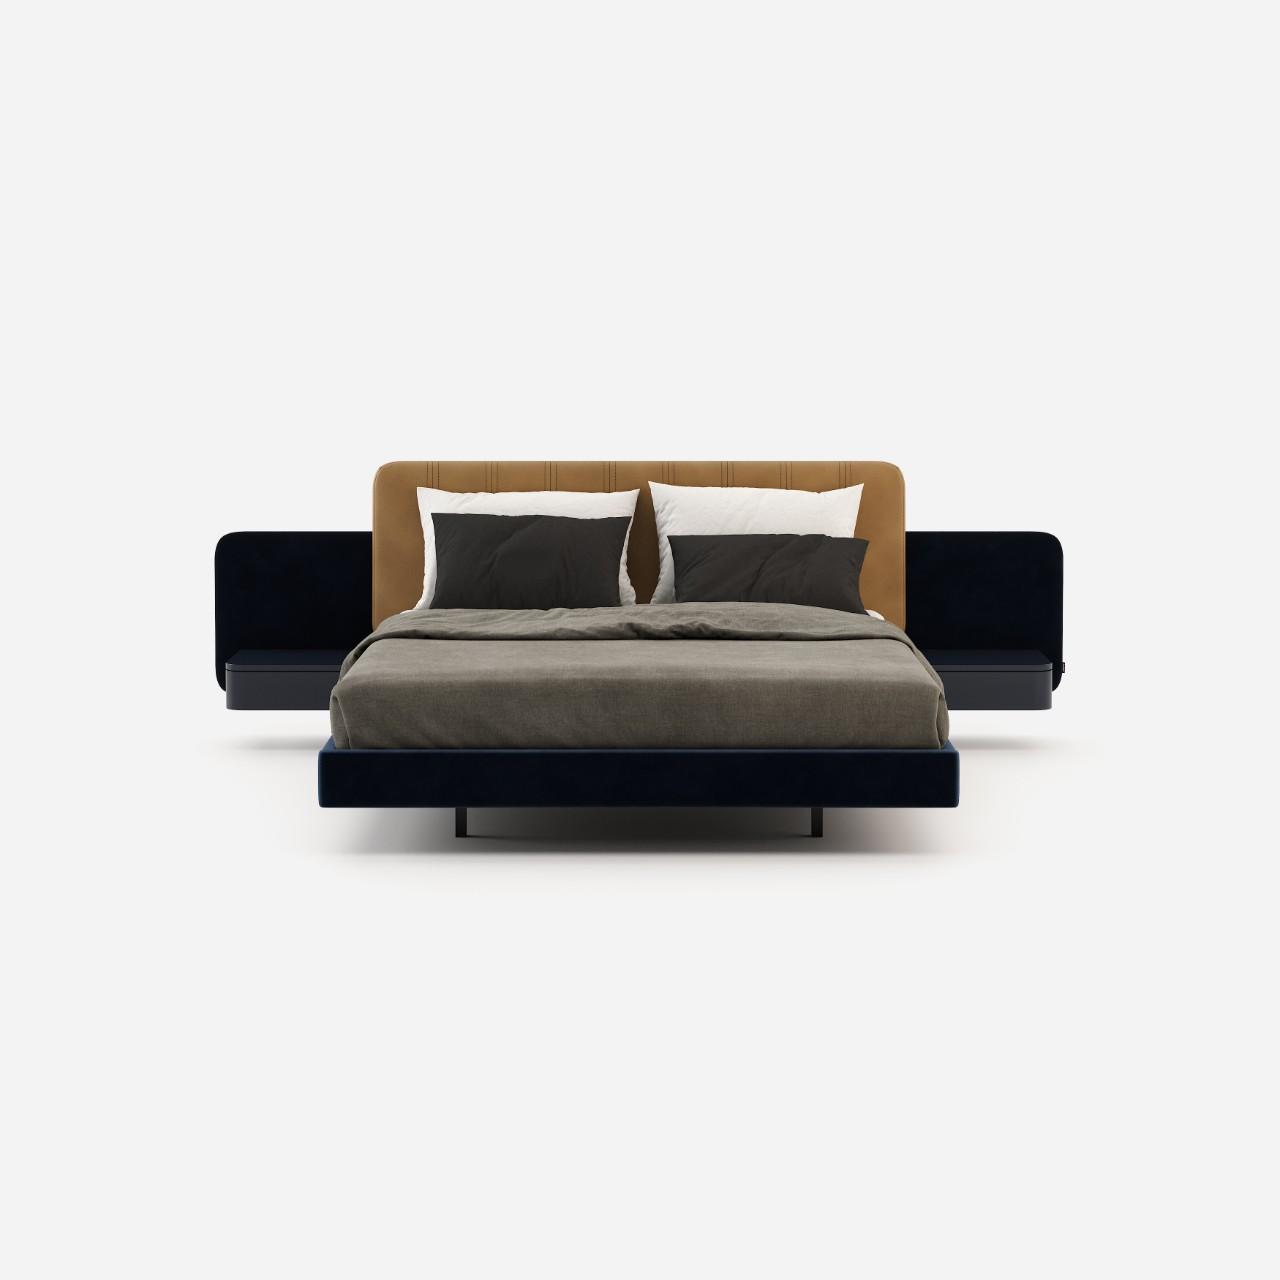 cama-amanda-domkapa-veludo-estofo-black-friday-decoracao-mobiliario